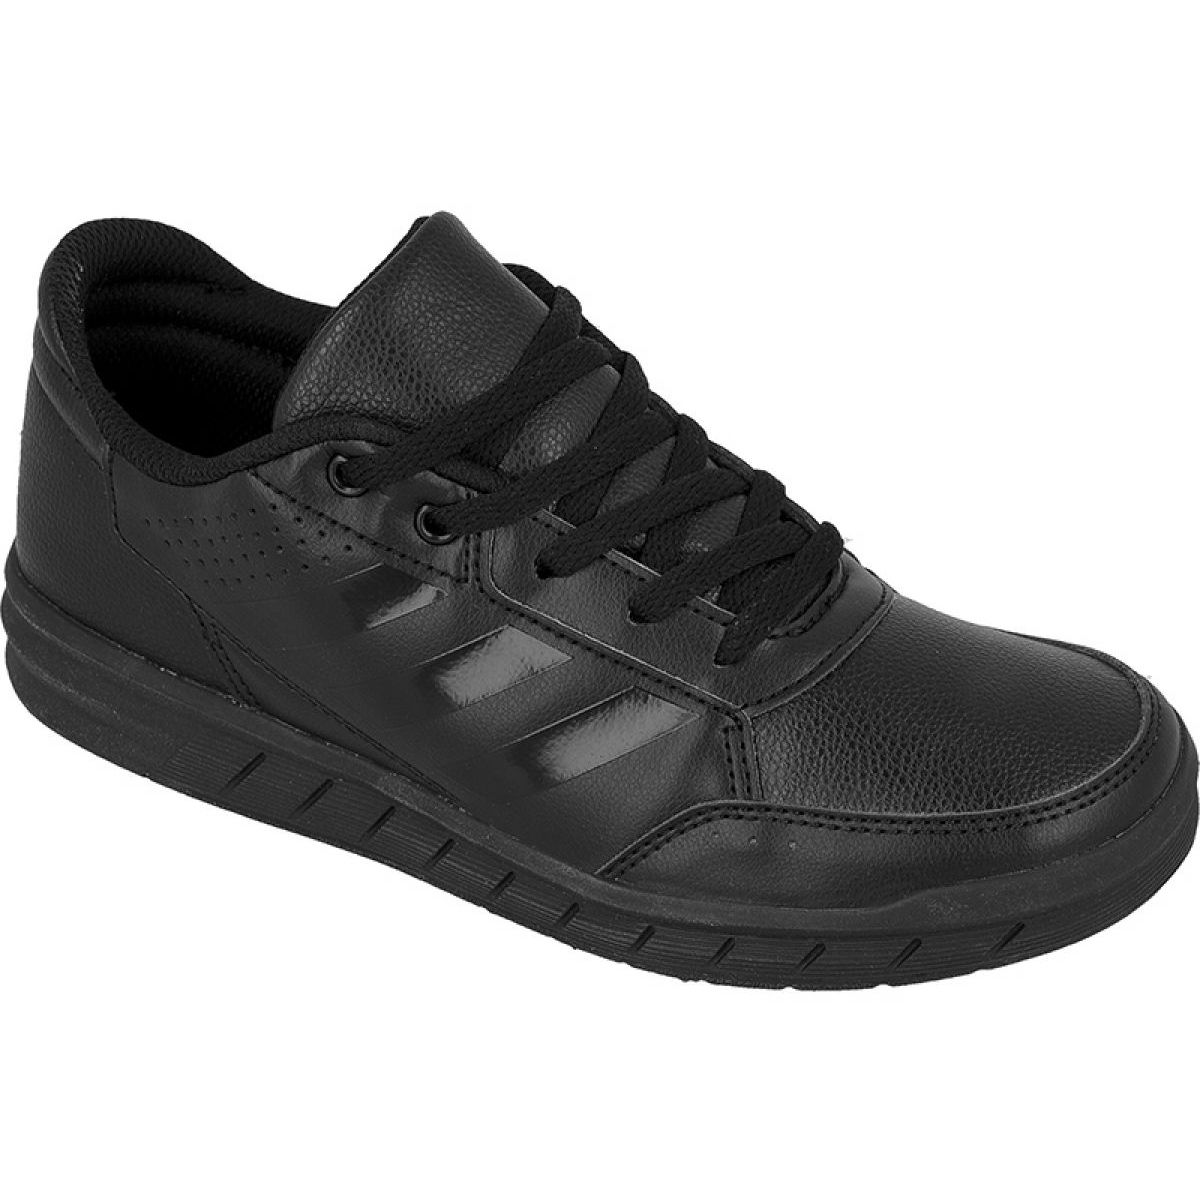 Buty Adidas Altasport K Jr Ba9541 Czarne Adidas Shoes Kid Shoes